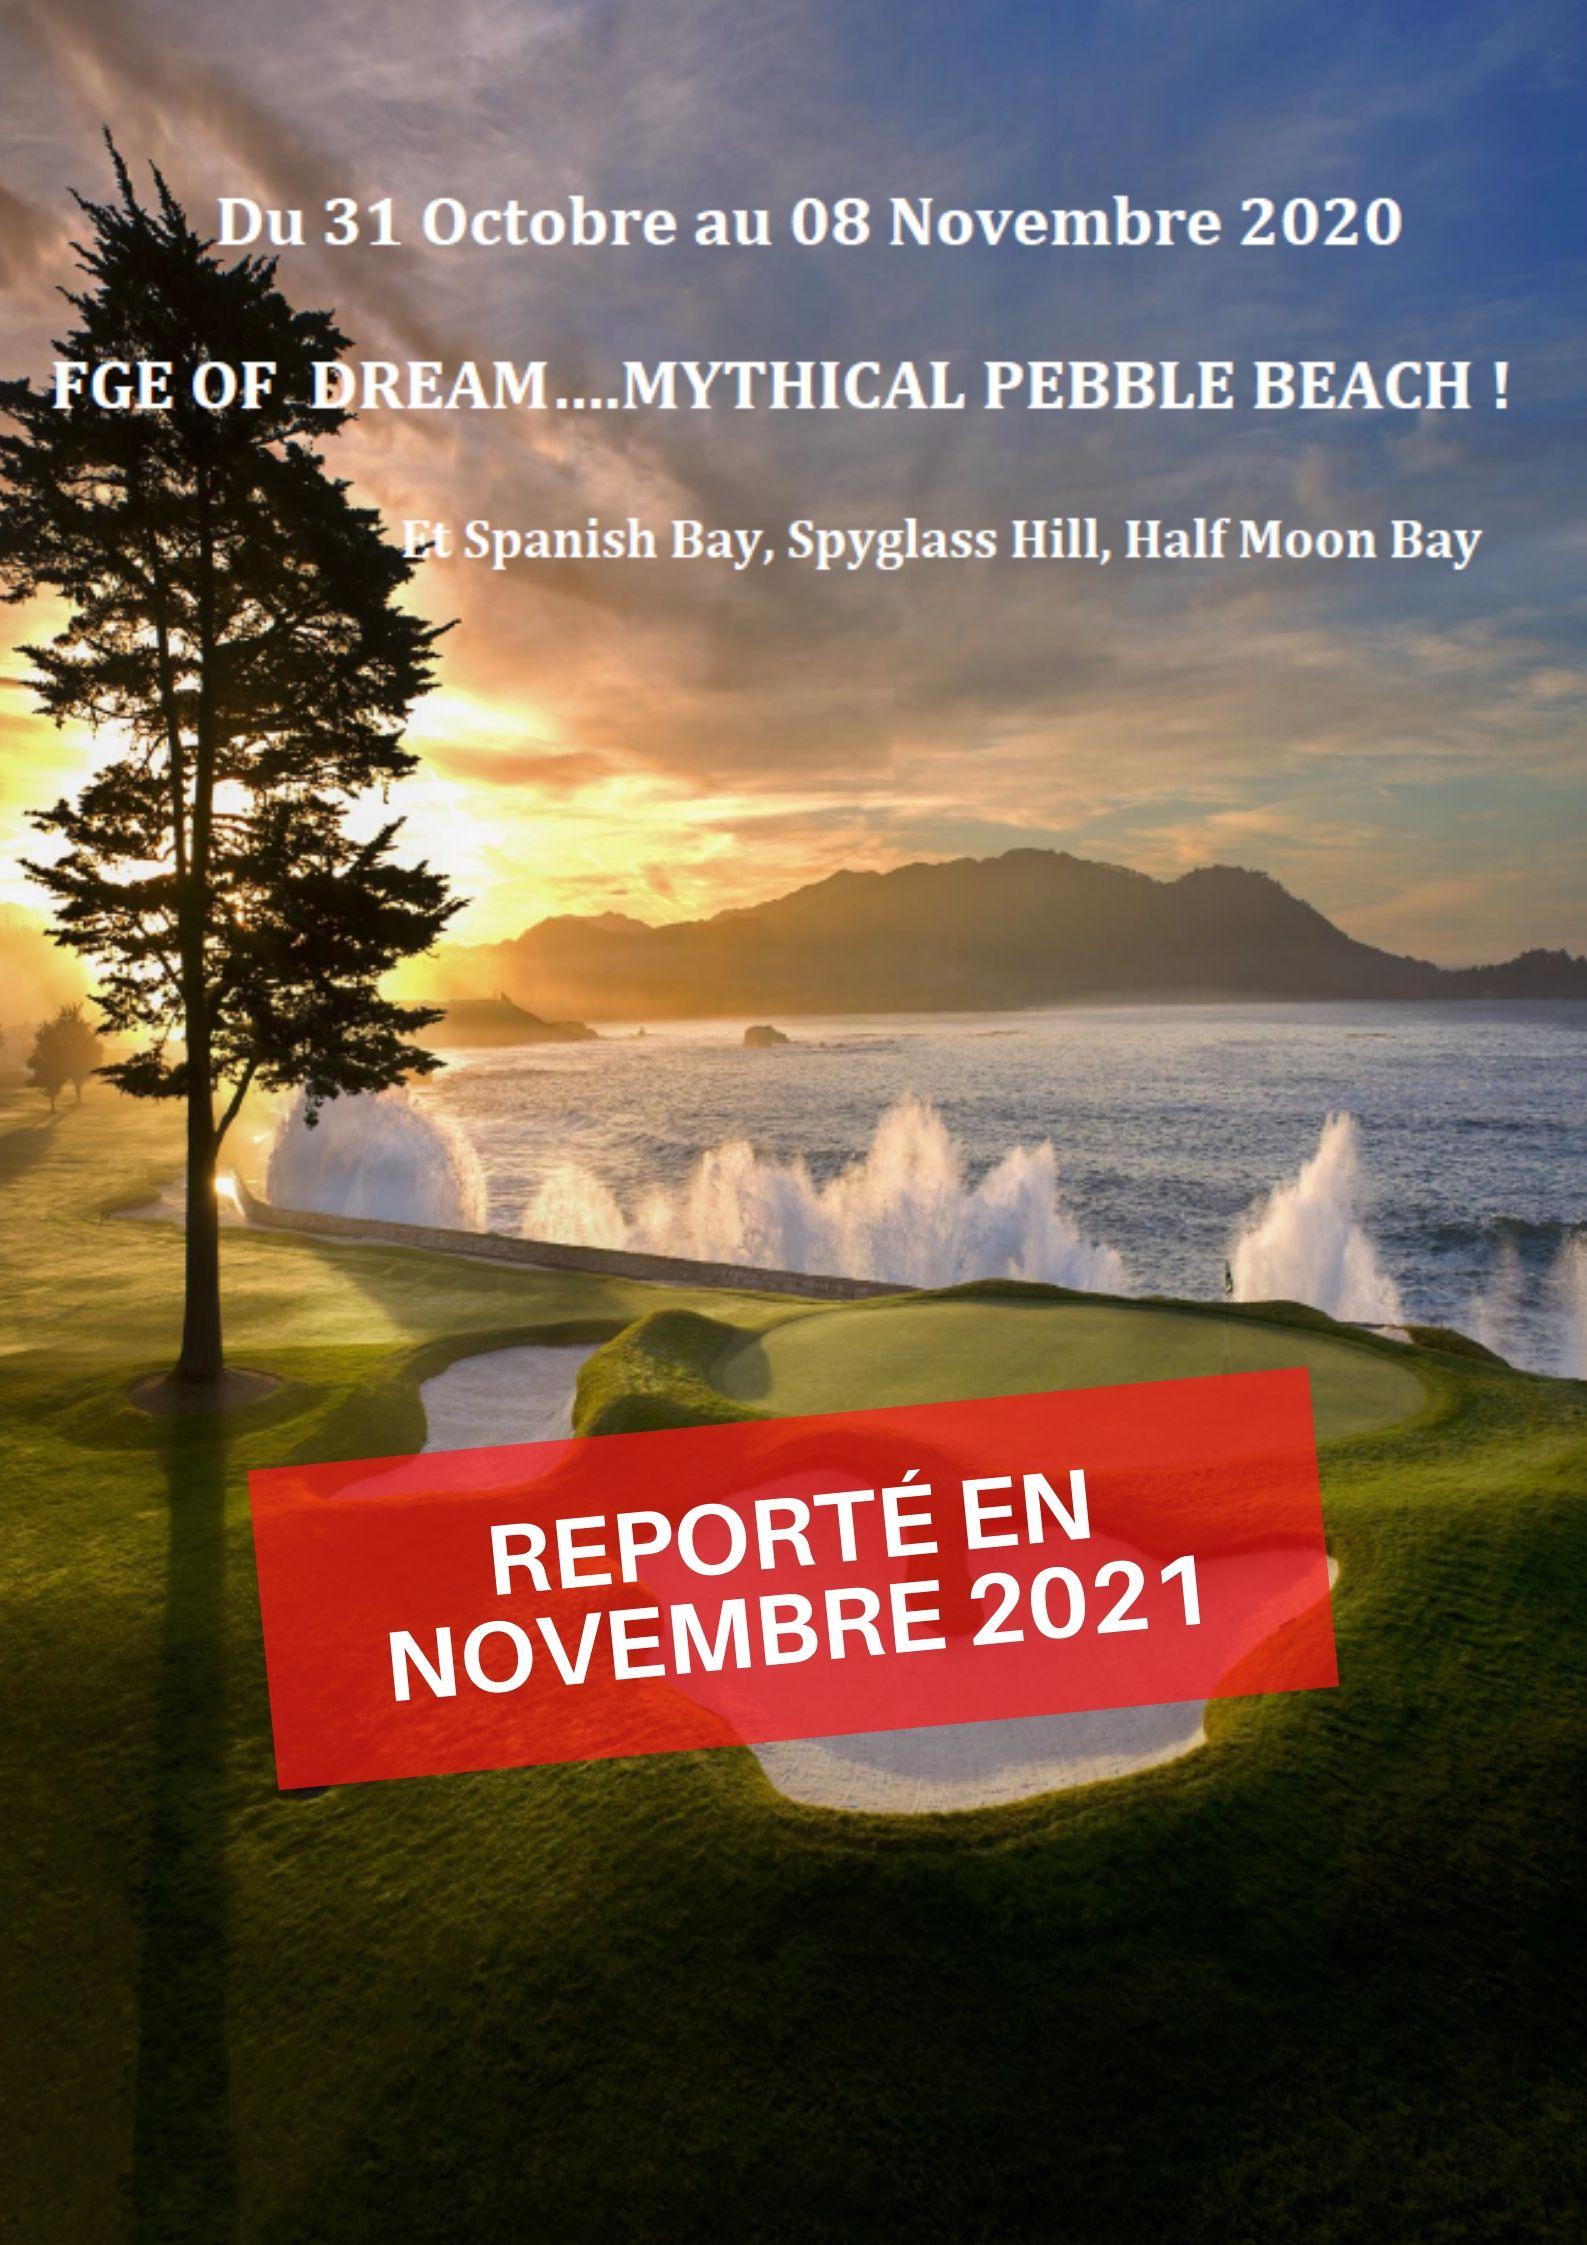 FGE Pebble Beach